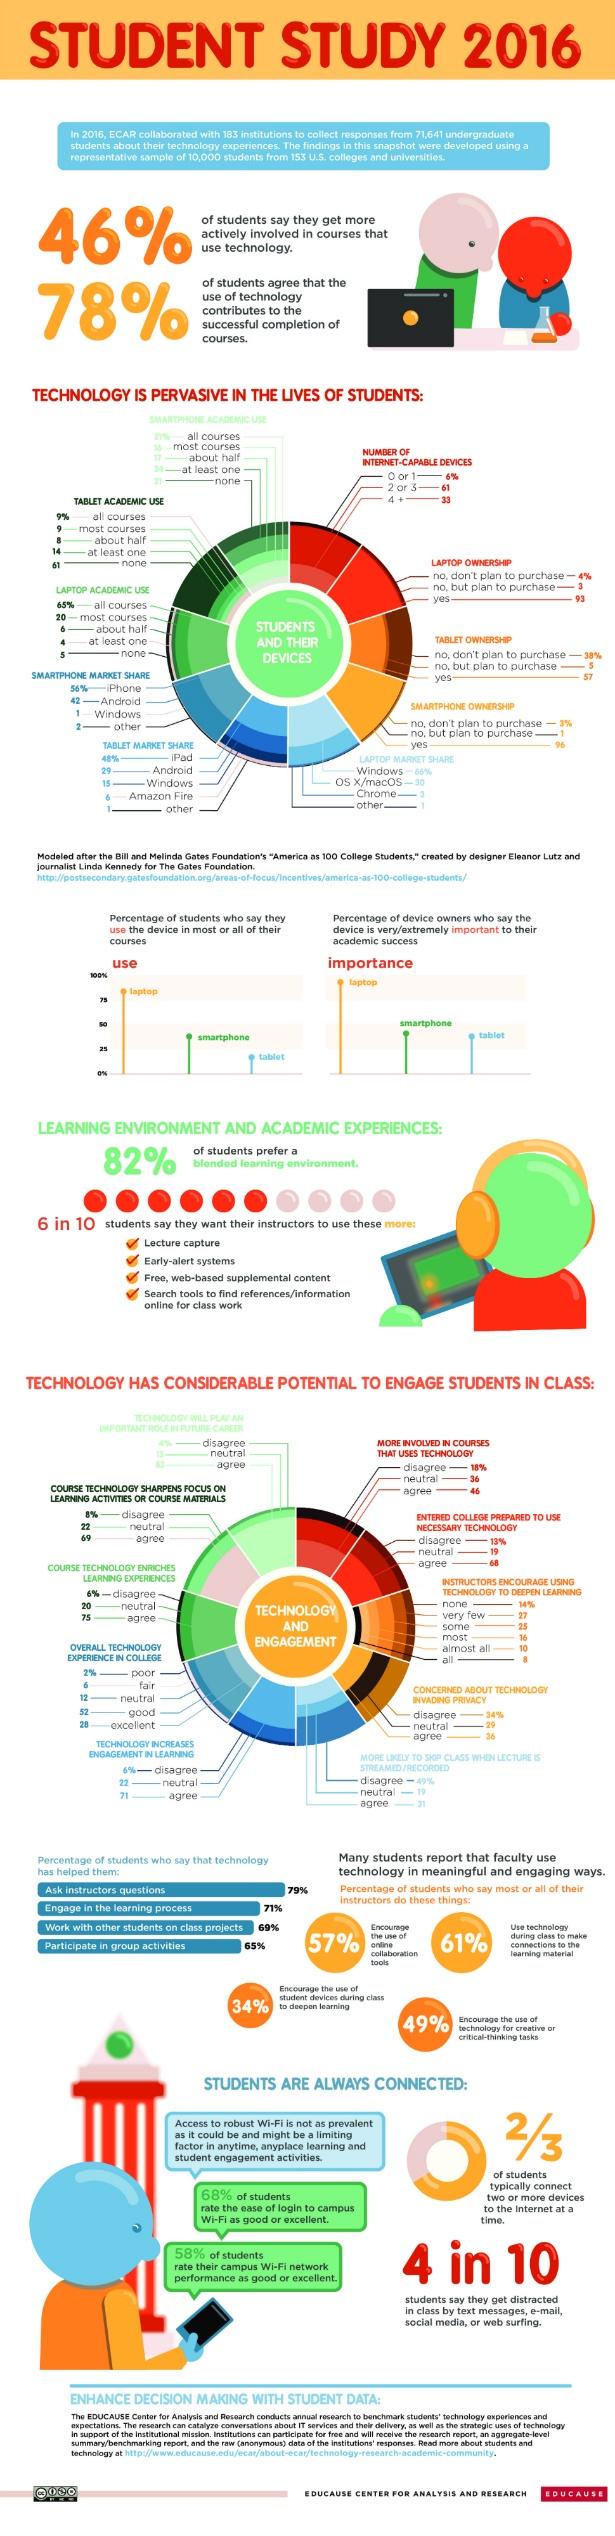 ECAR Study 2016 - Higher Education.jpg